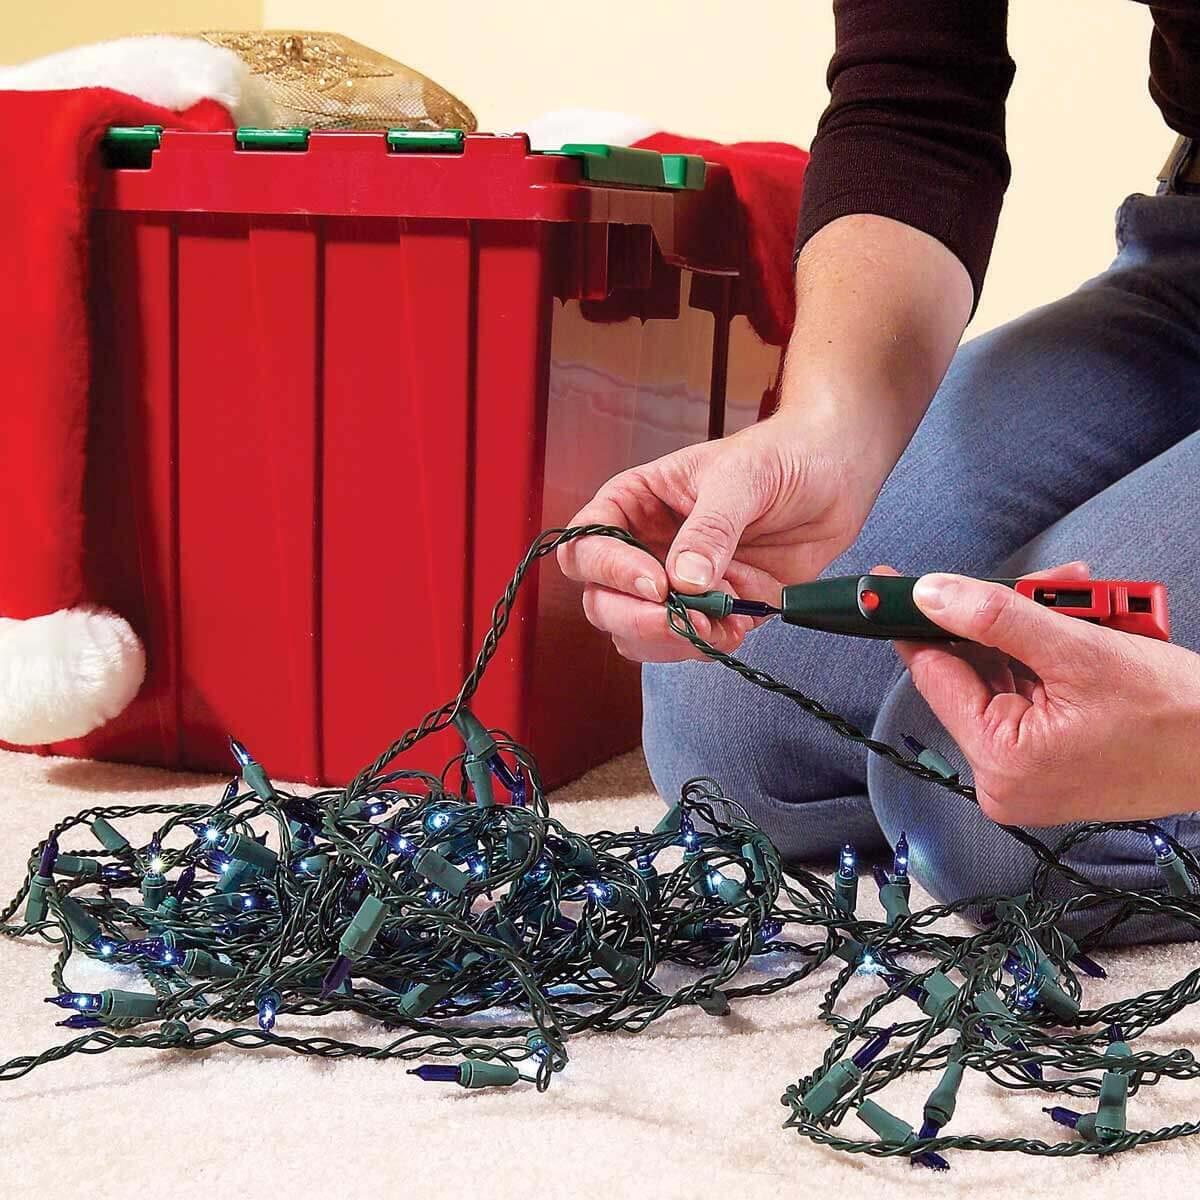 FH06DJA_464_05_002 holiday lights bulb tester